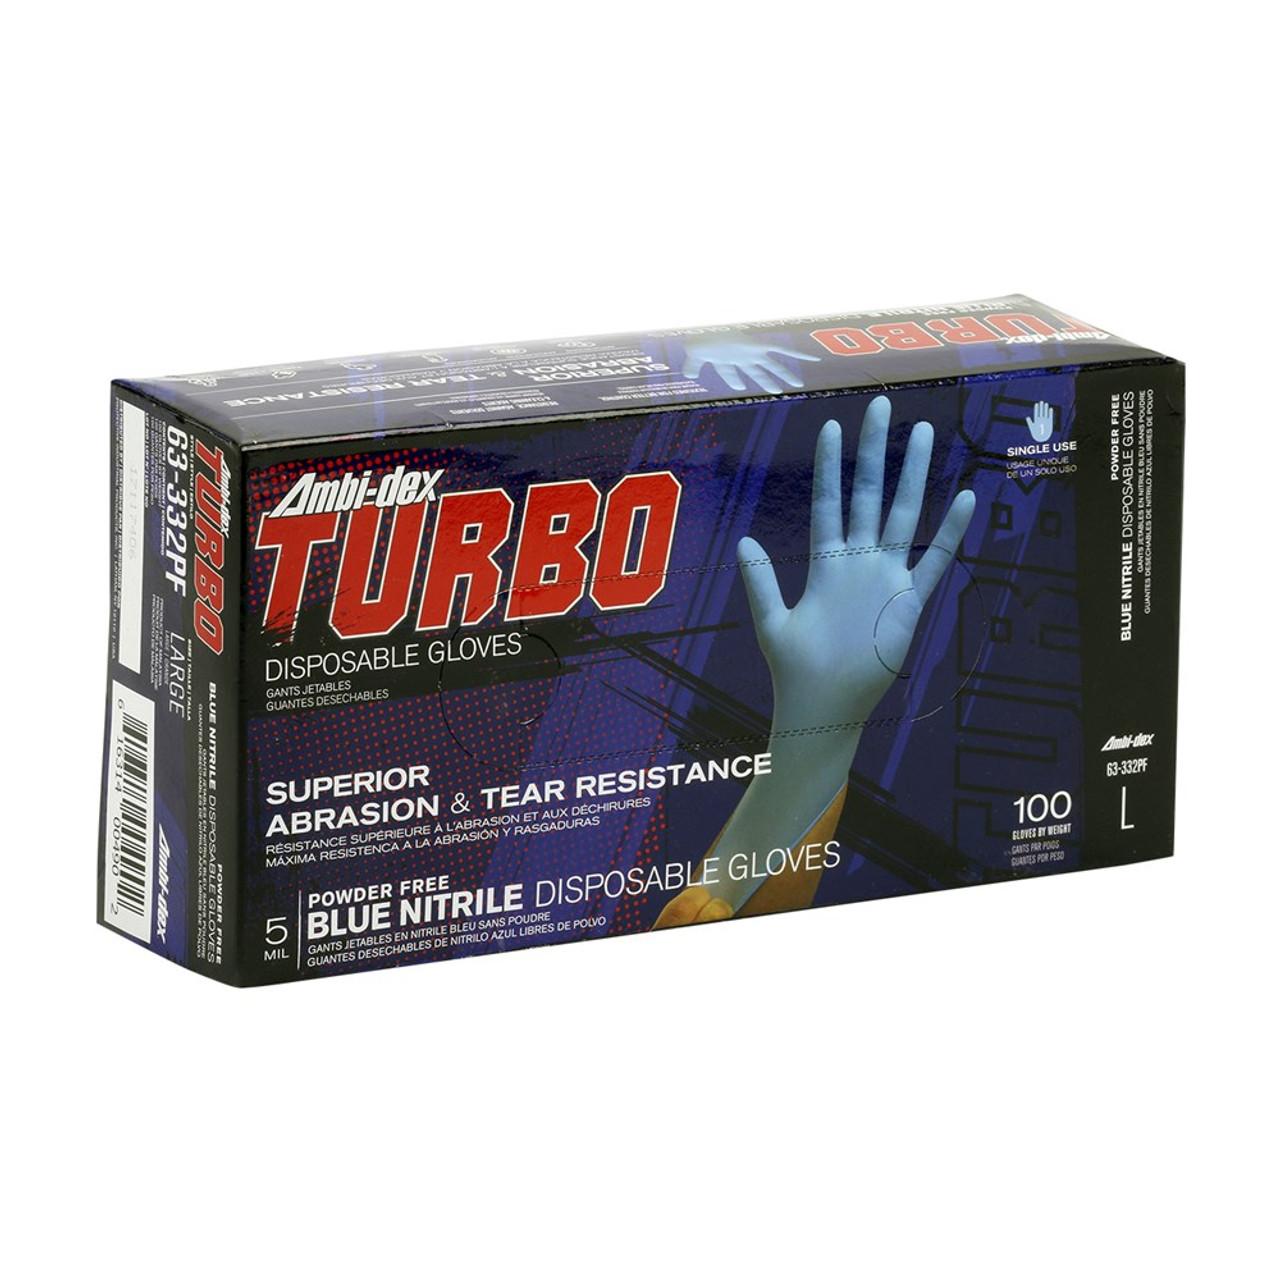 PIP TURBO Blue Nitrile Gloves Box 100ct